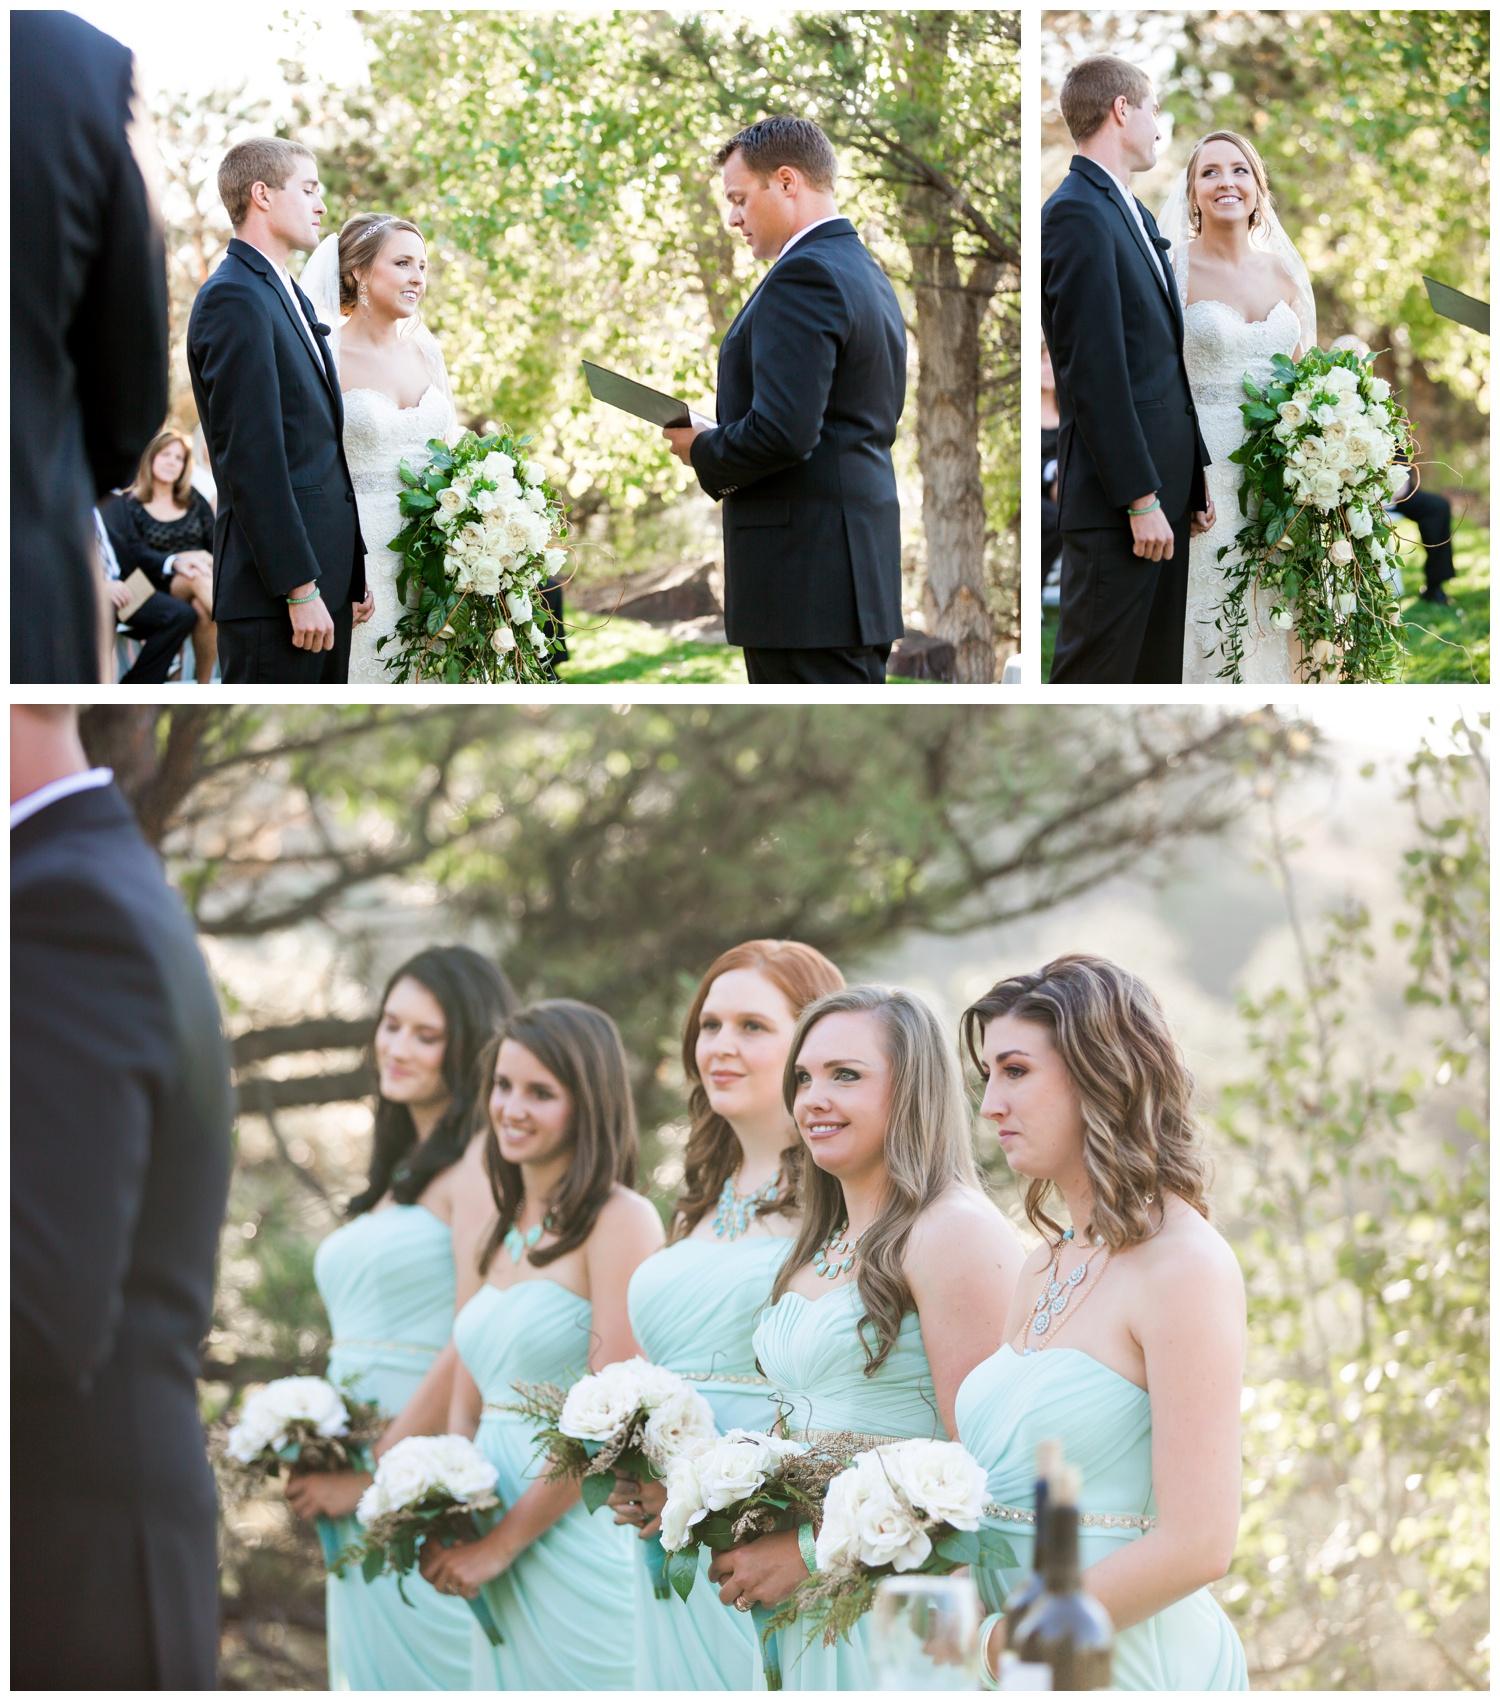 lionscrest manor wedding photography16.jpg